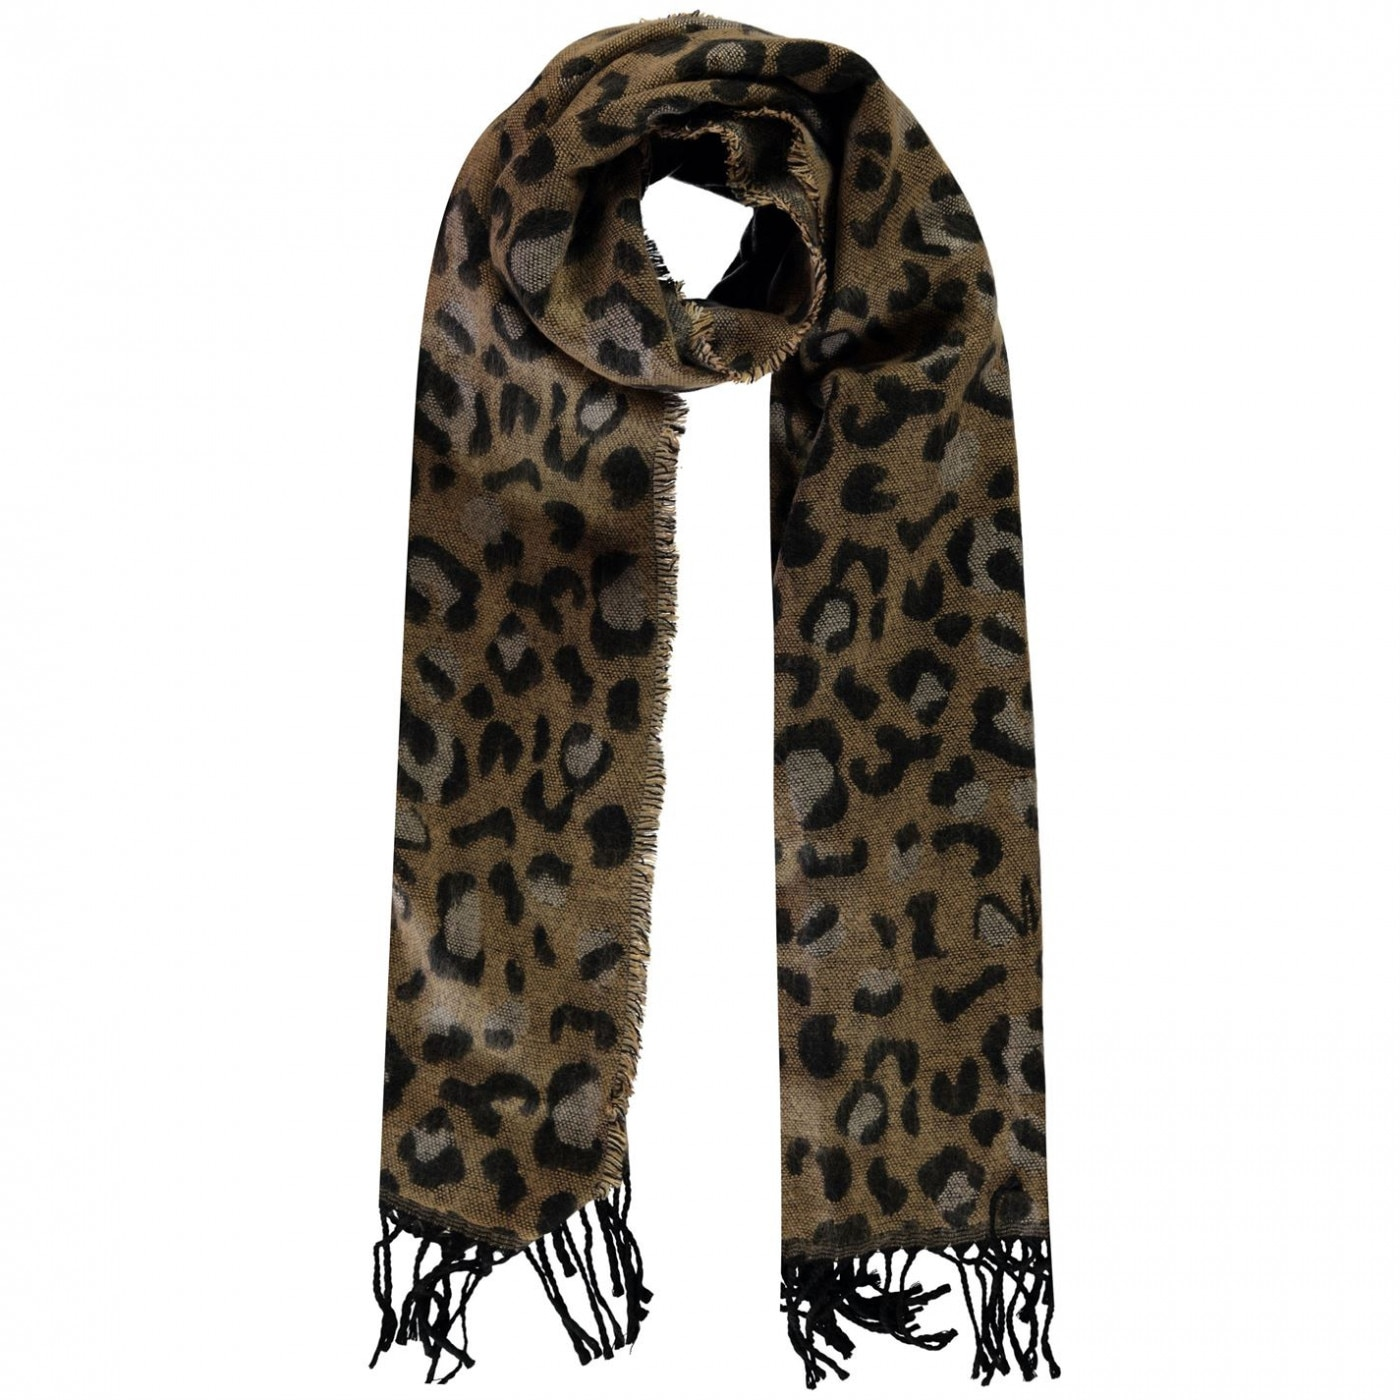 Biba Leopard Print Scarf